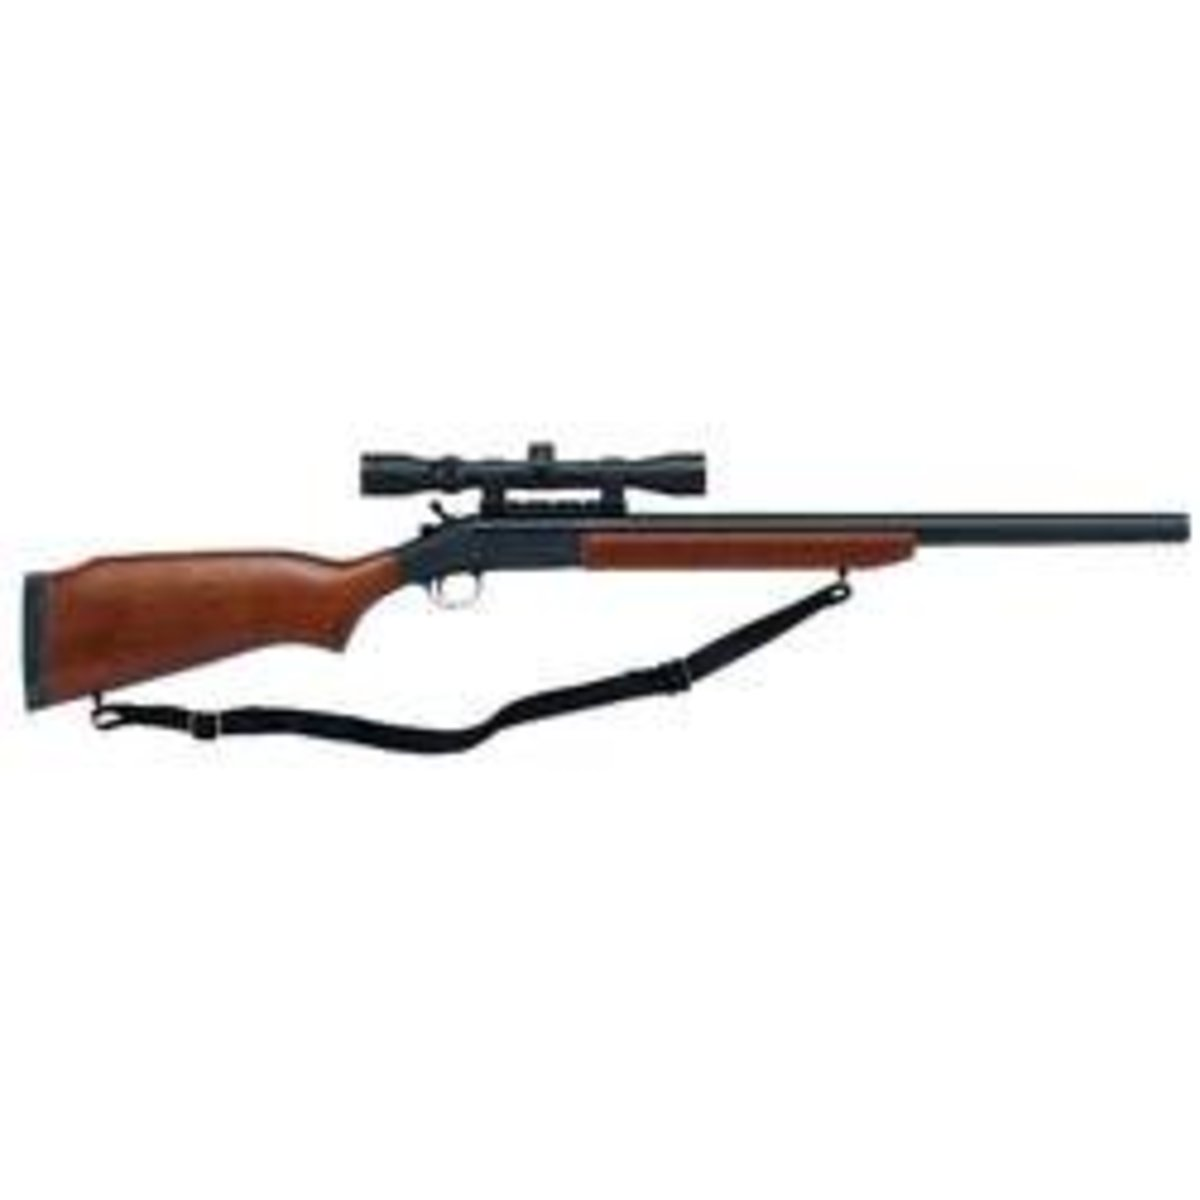 "H&R Ultra Slug Hunter Single Shot Shotgun 12 Gauge 24"" Rifled Barrel 3"" Chamber Hardwood Stock Blue Barrel 3-9x32mm Scope"